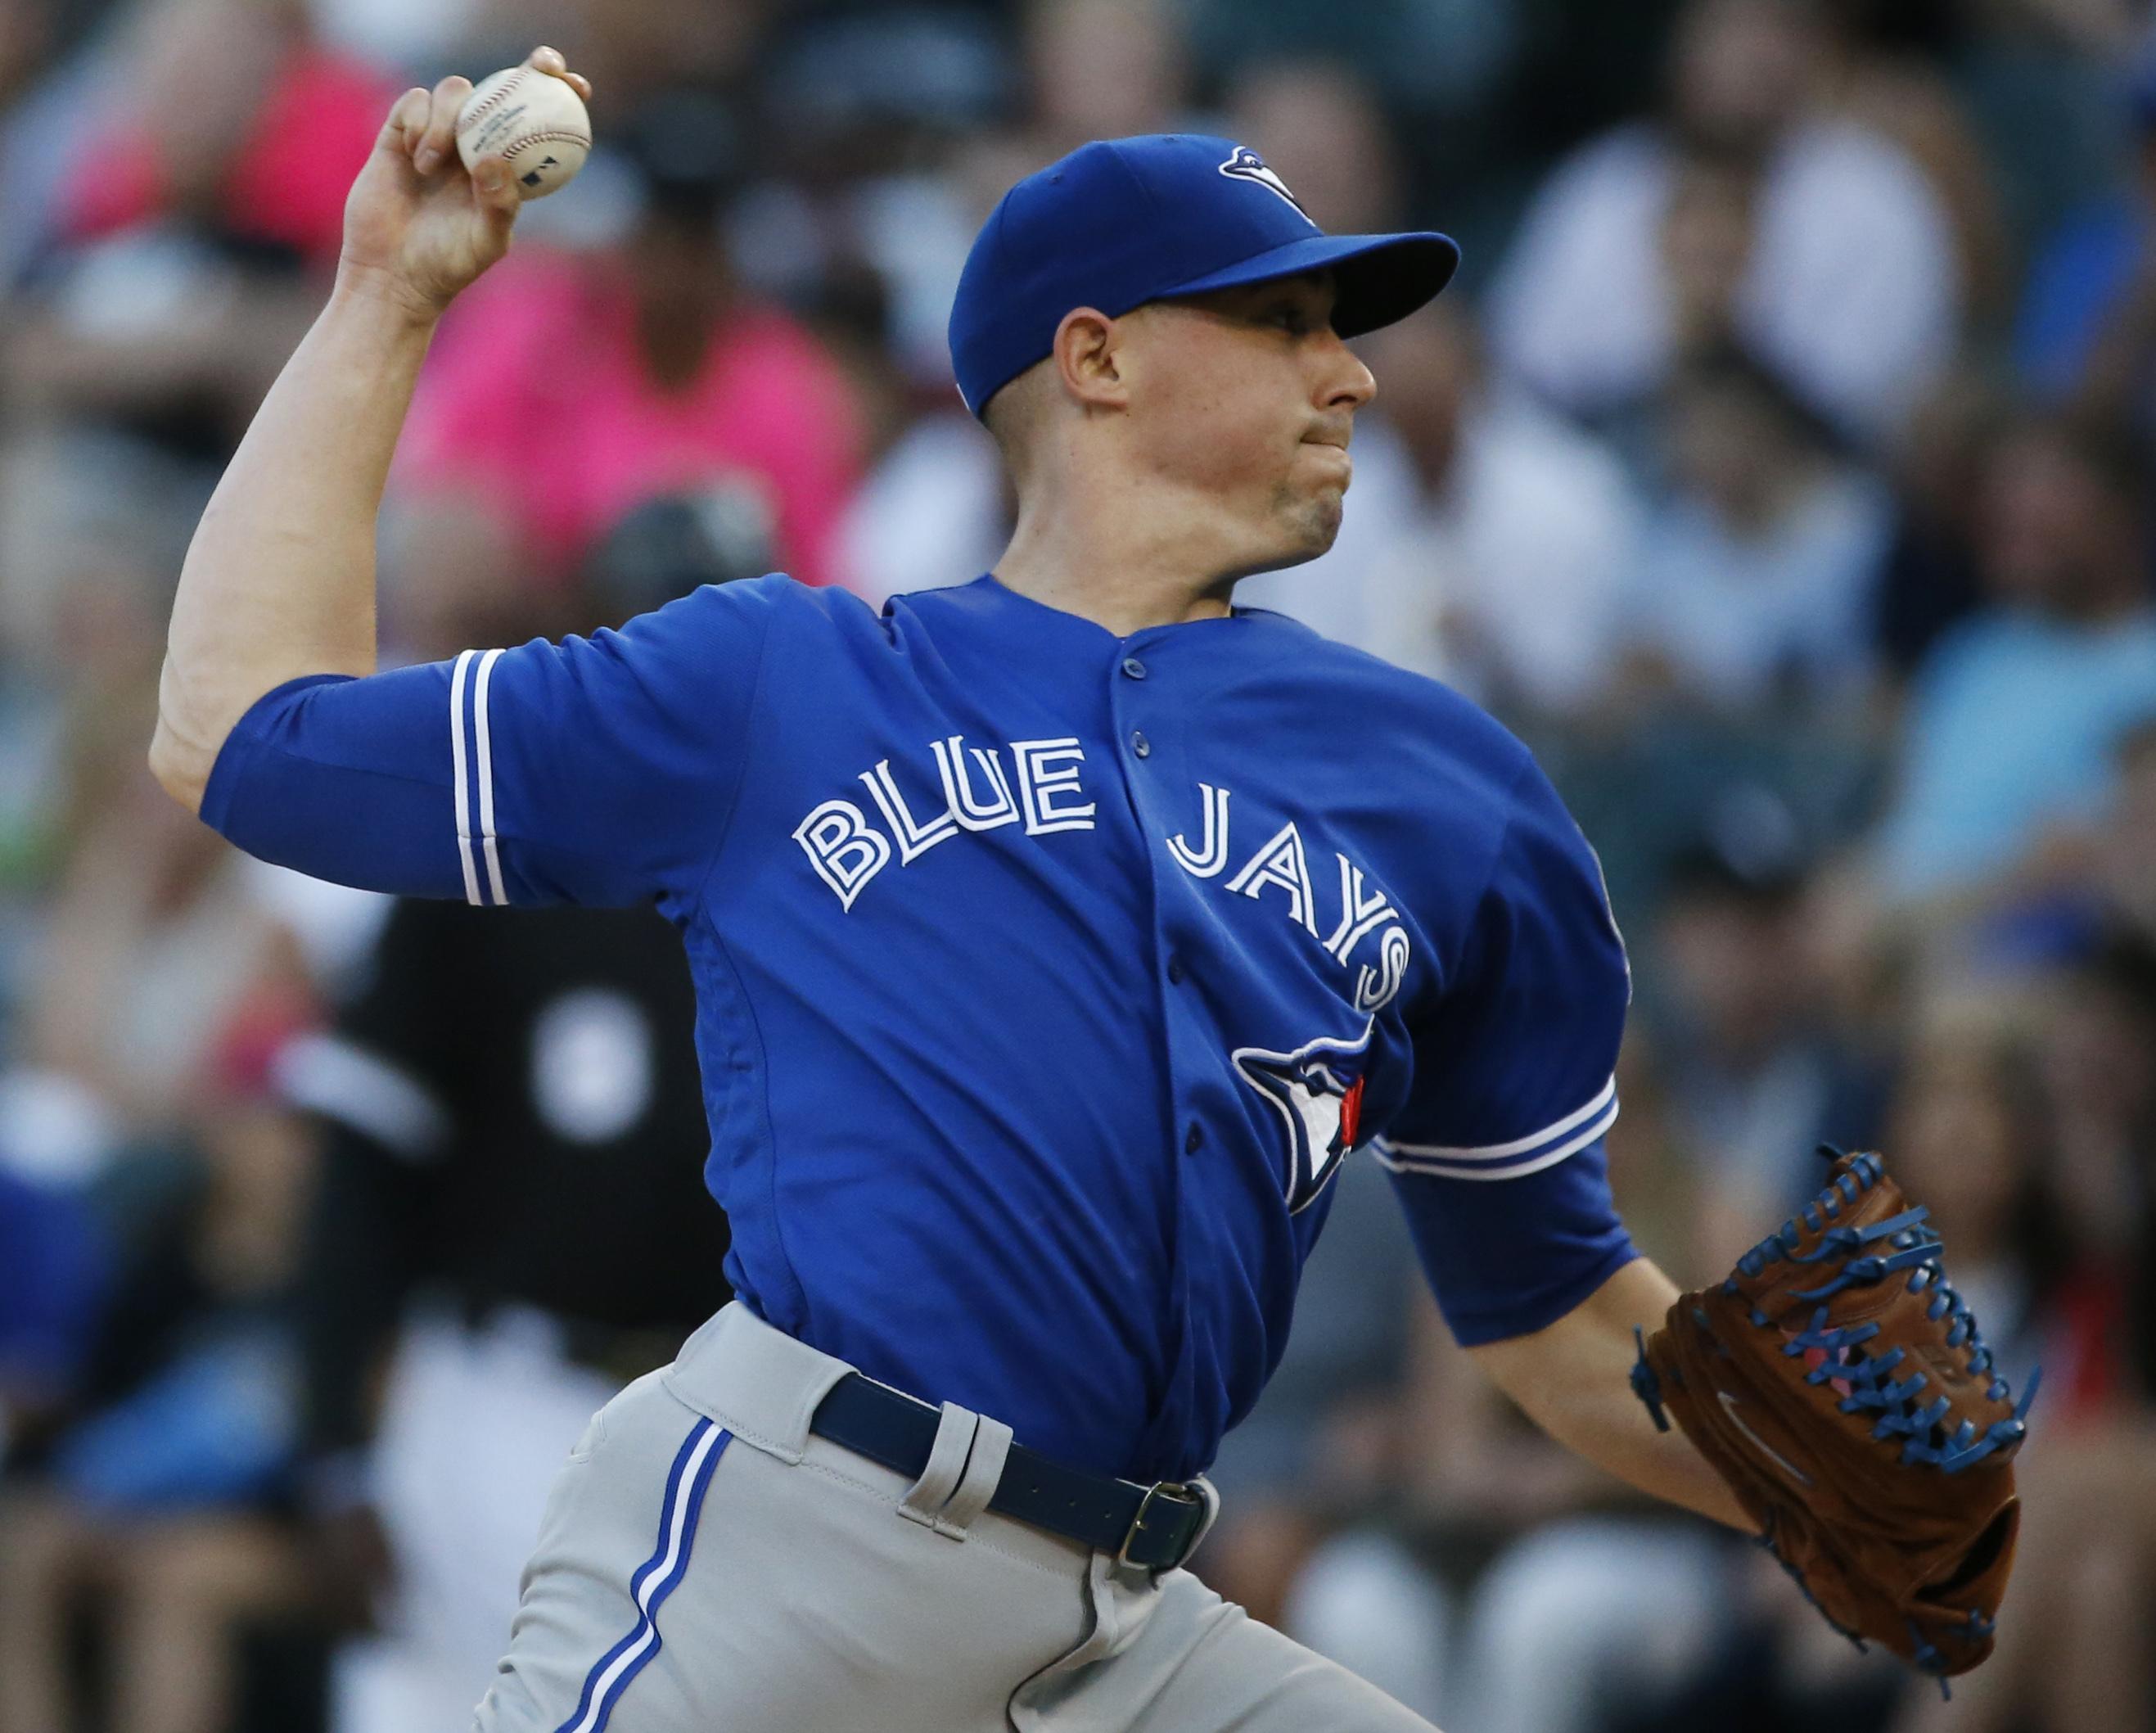 Blue_jays_white_sox_baseball